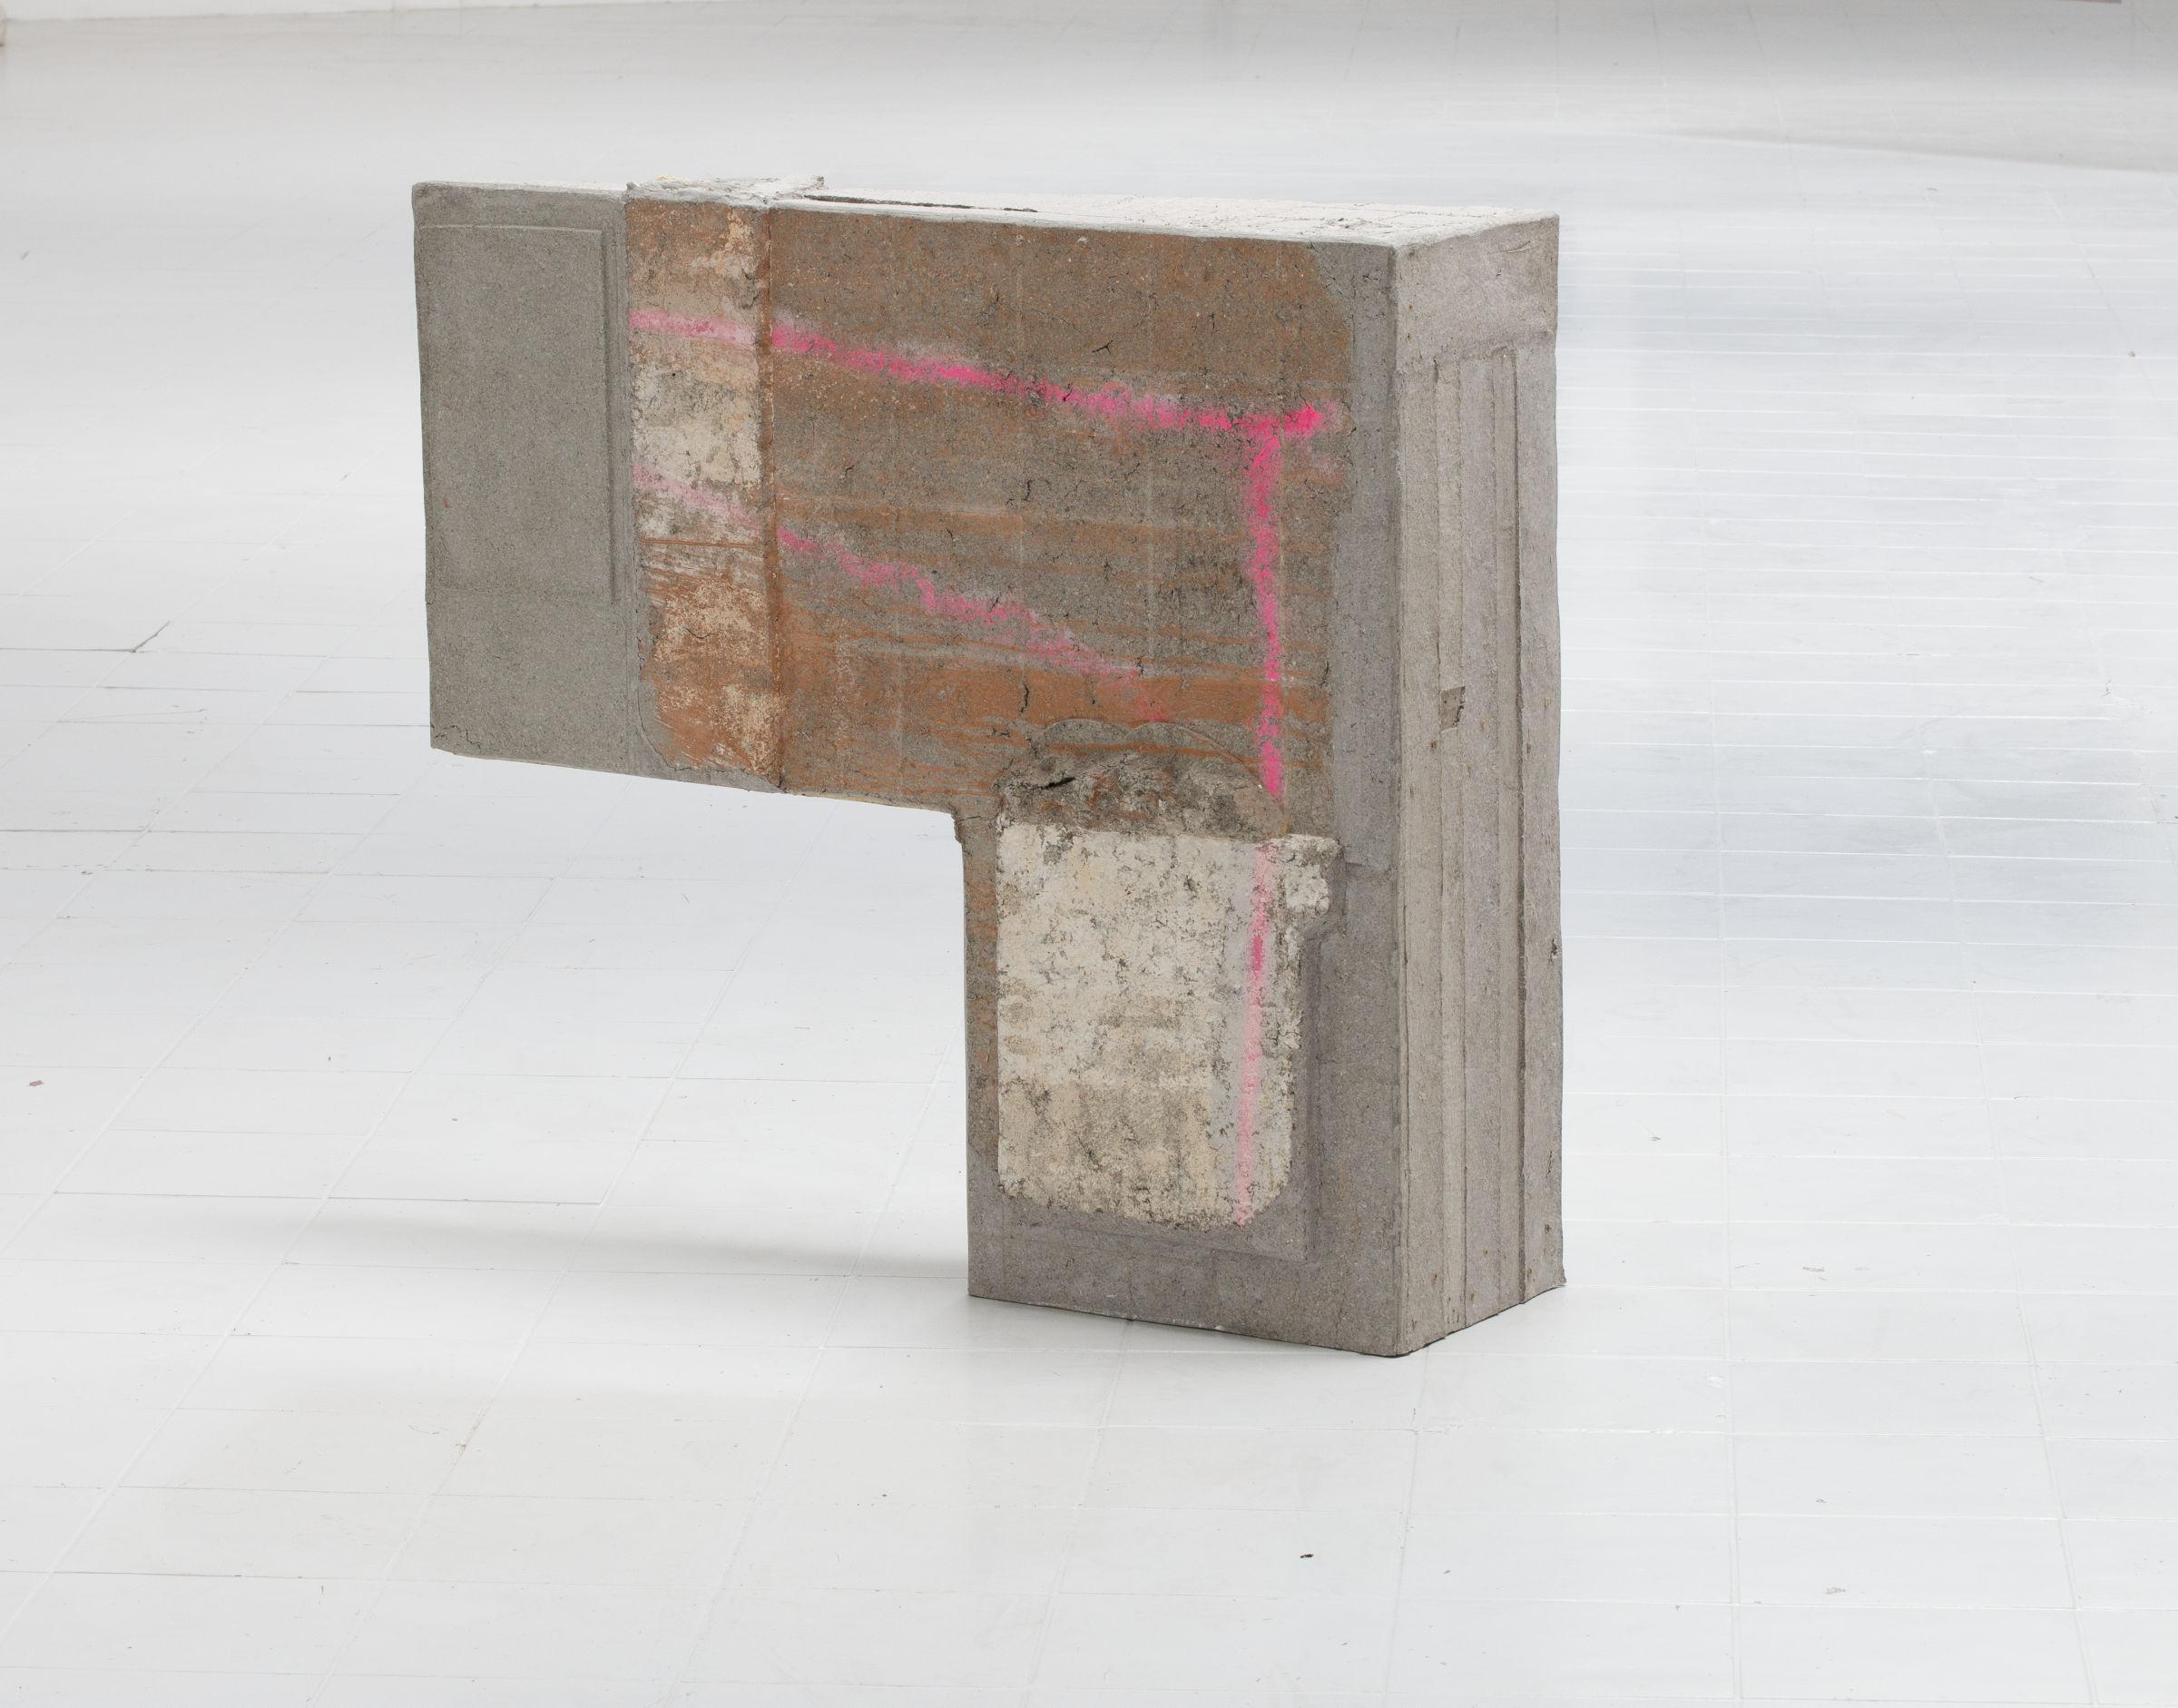 Keil-II-_2019_-Pappmachewandabformungen-140cm-135cm-35cm_MG_0061-1